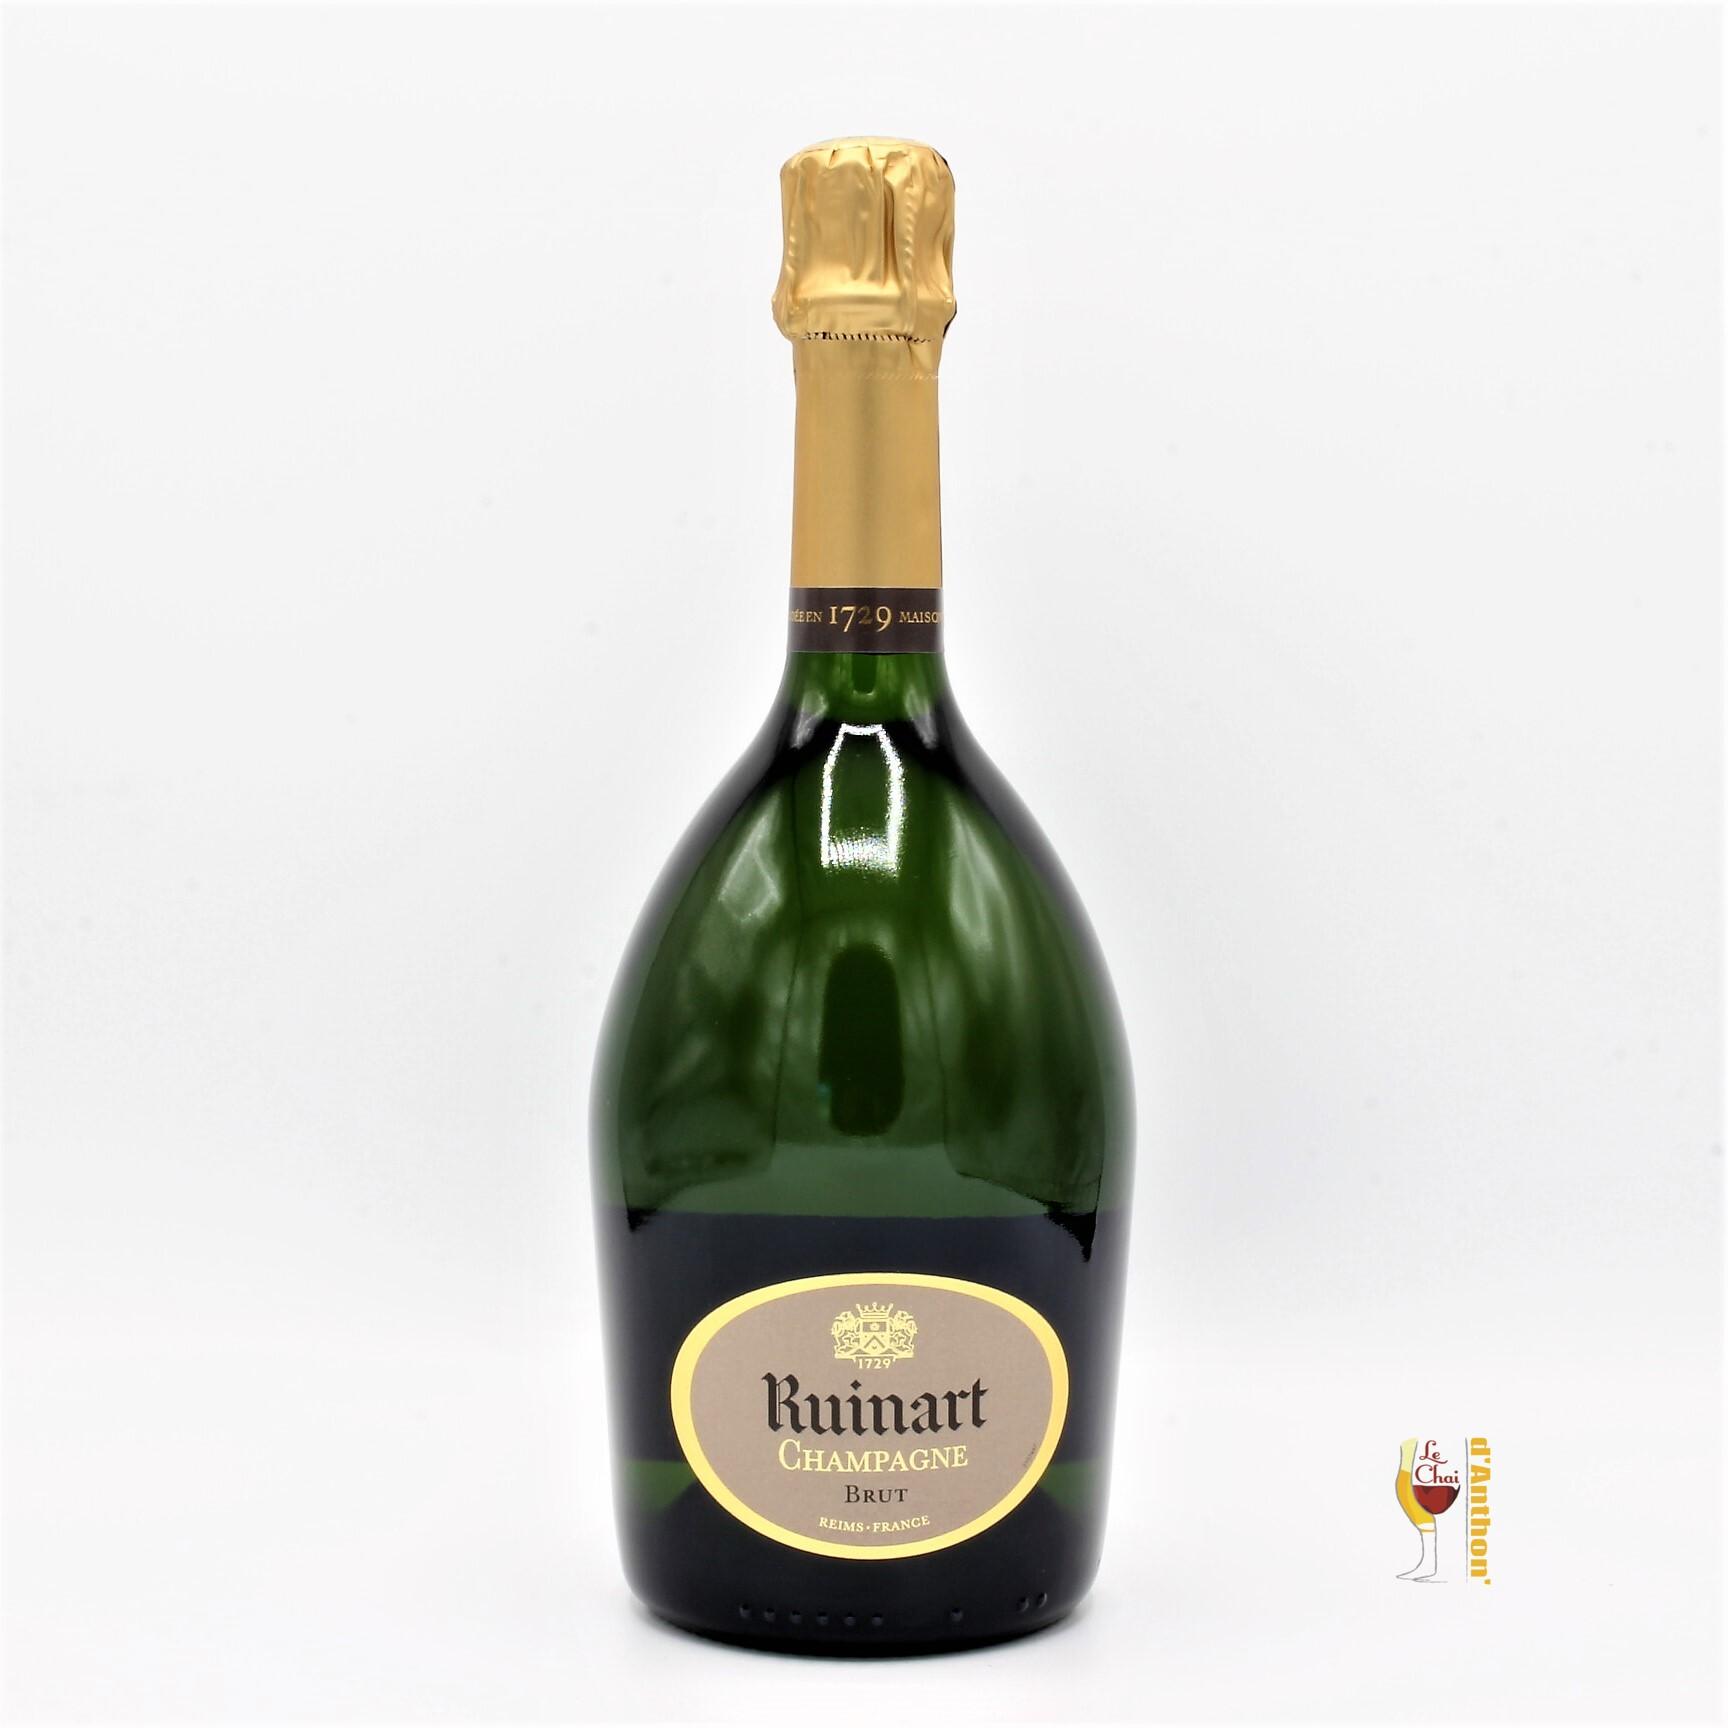 Vin Effervescent Bouteille Champagne Brut Ruinart 75cl